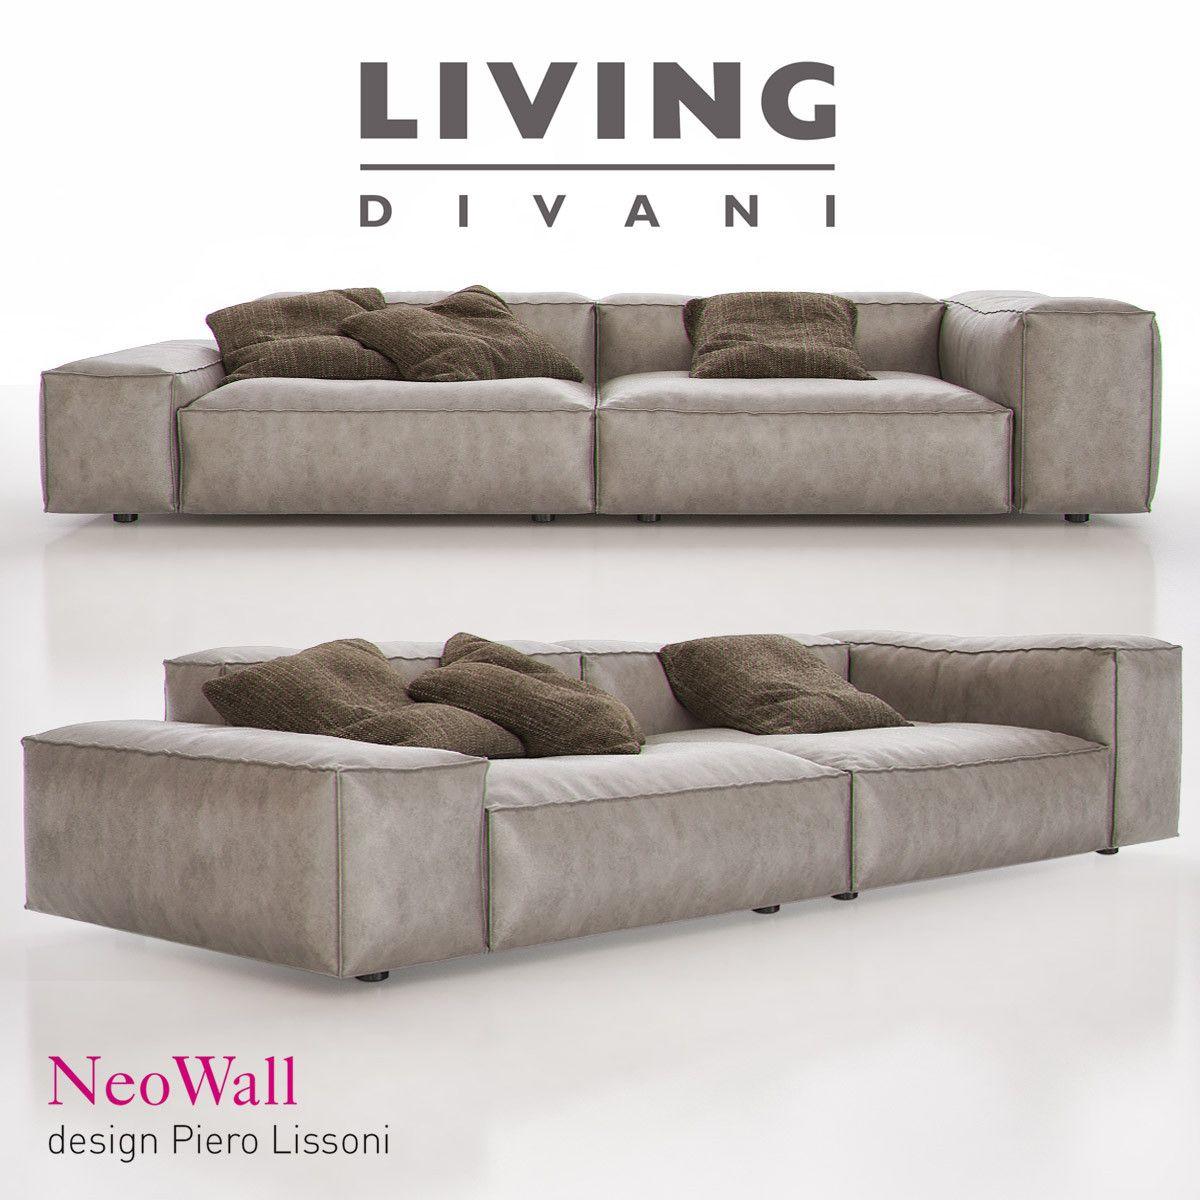 Living Divani Neowall 3D Max 3D Model l r in 2019